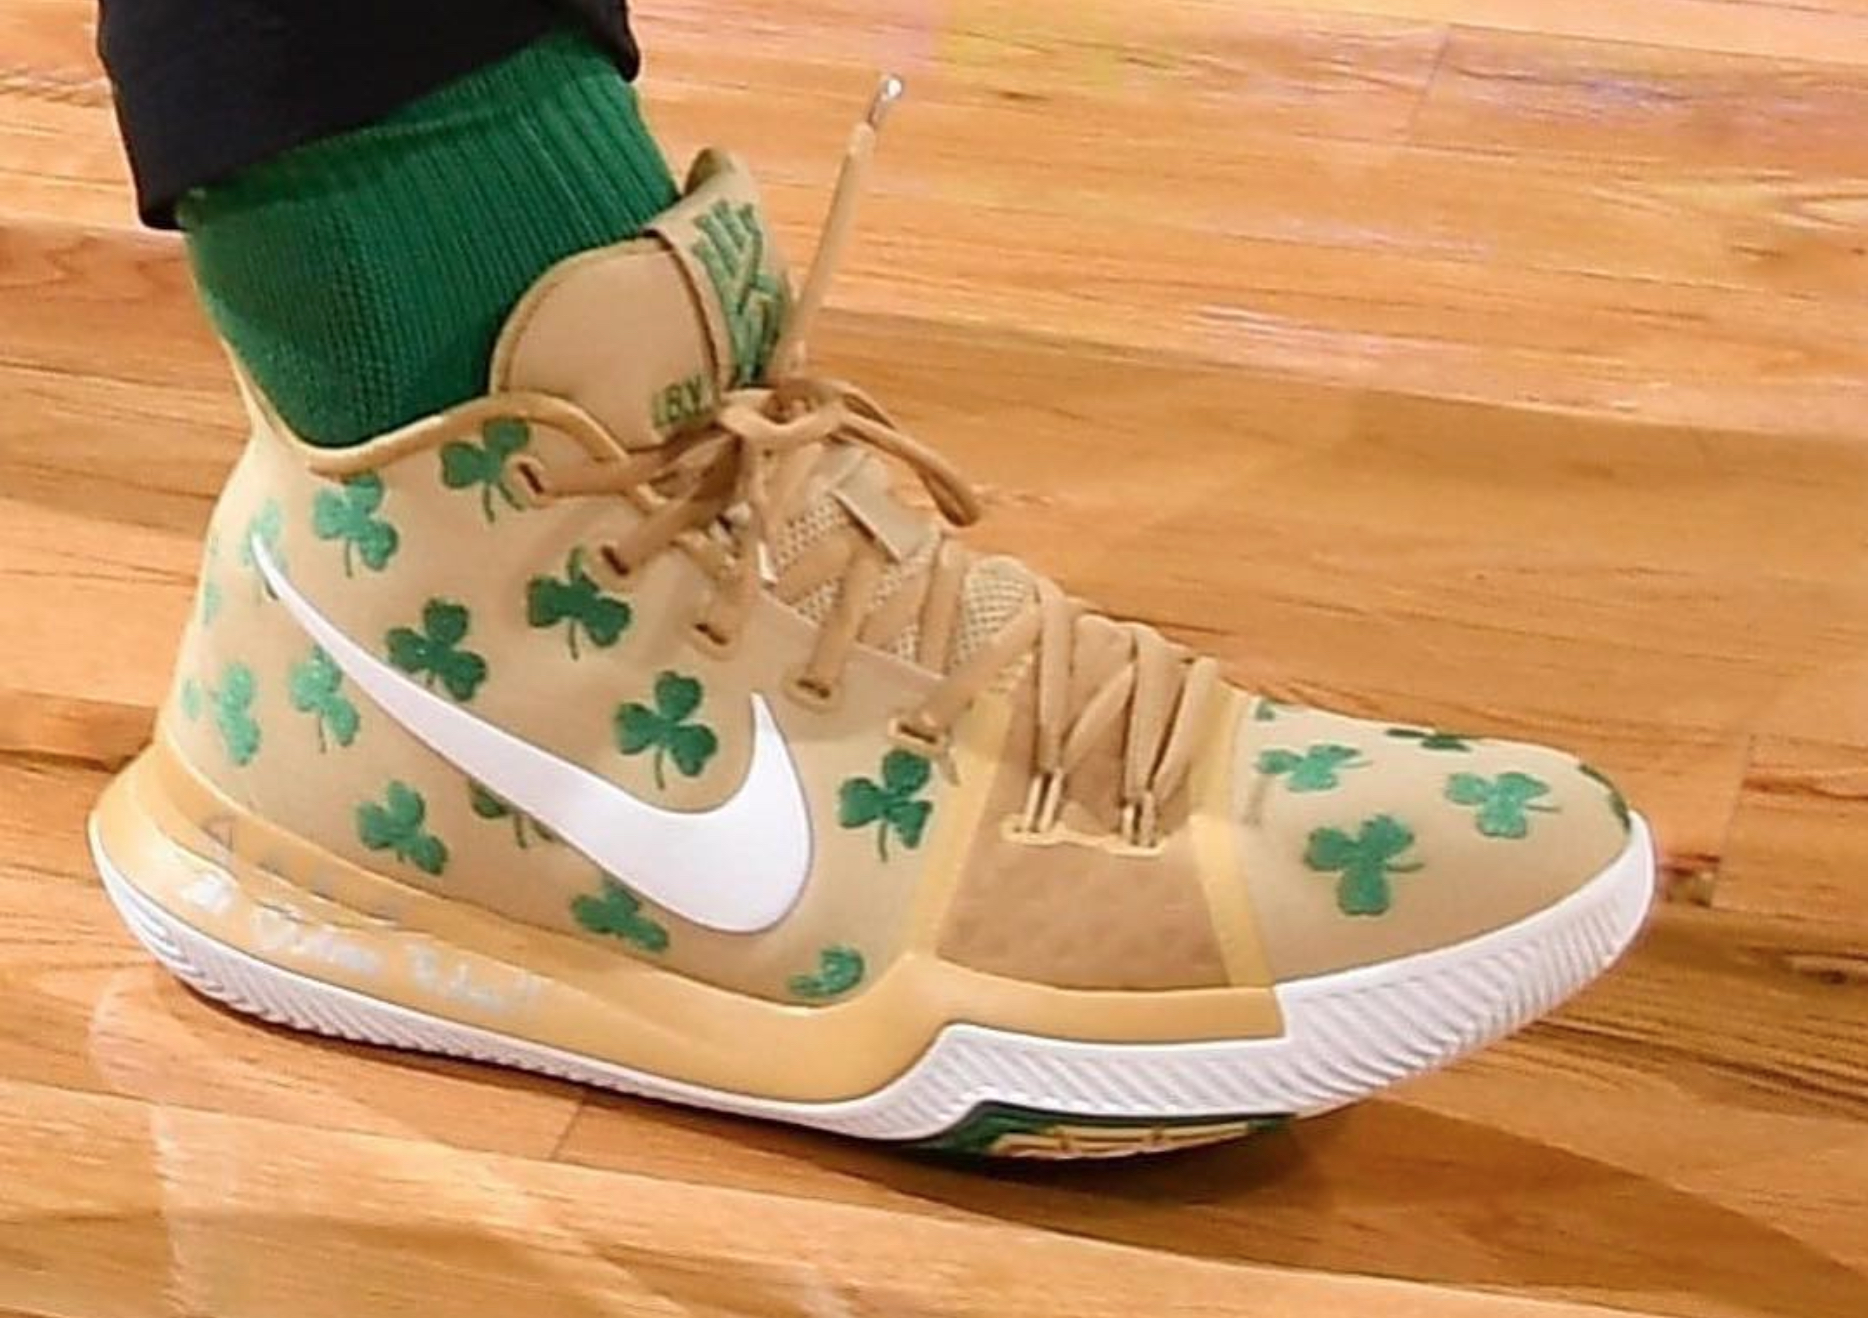 kyrie 3 shoes boston